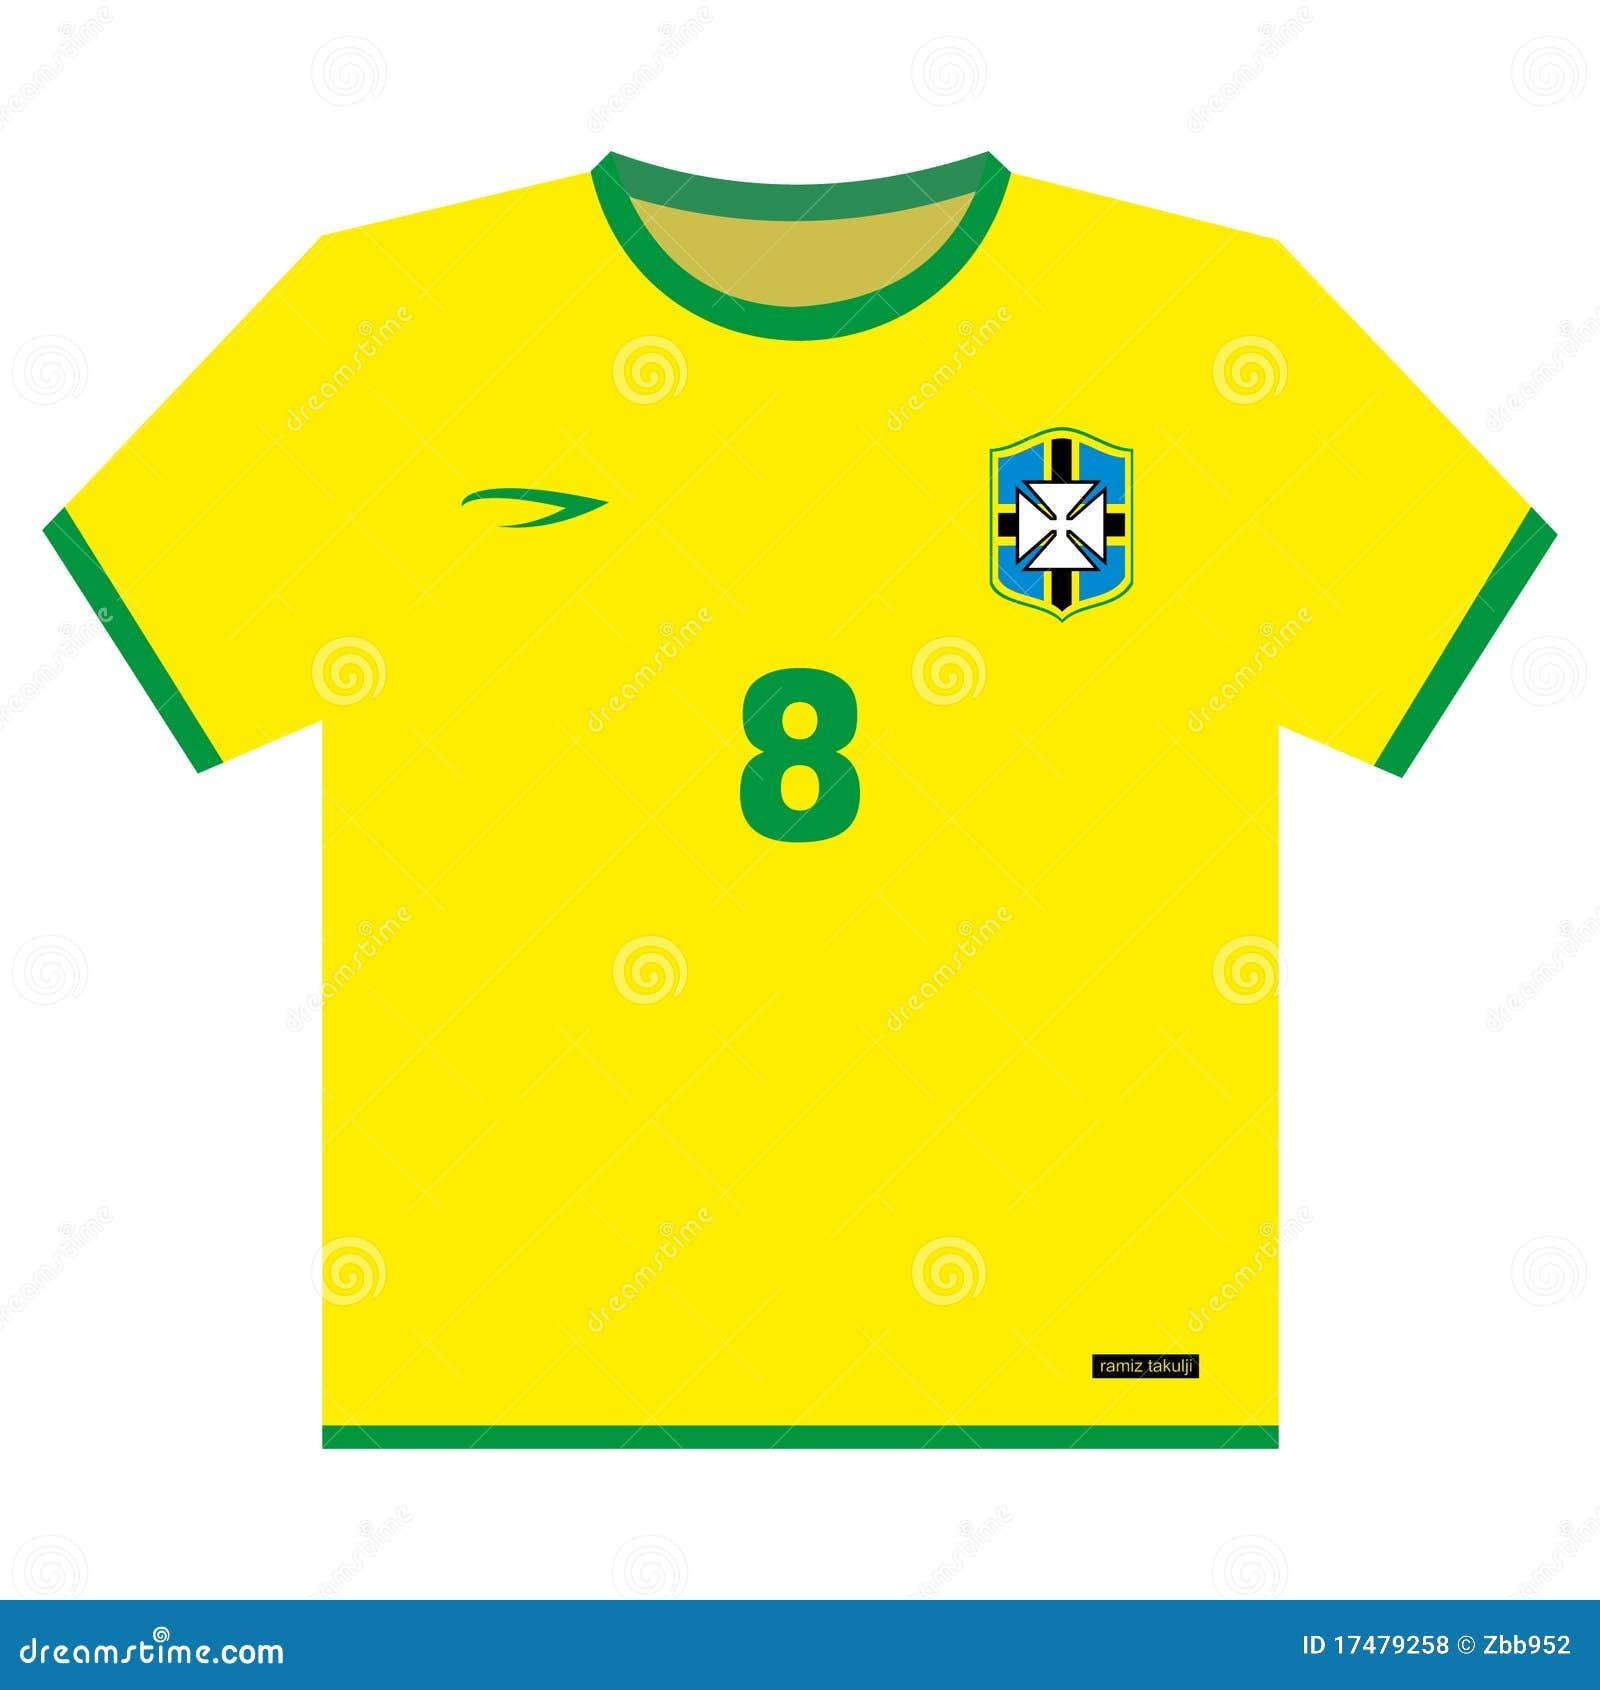 Football (soccer) Shirt Royalty Free Stock Photos - Image: 17479258